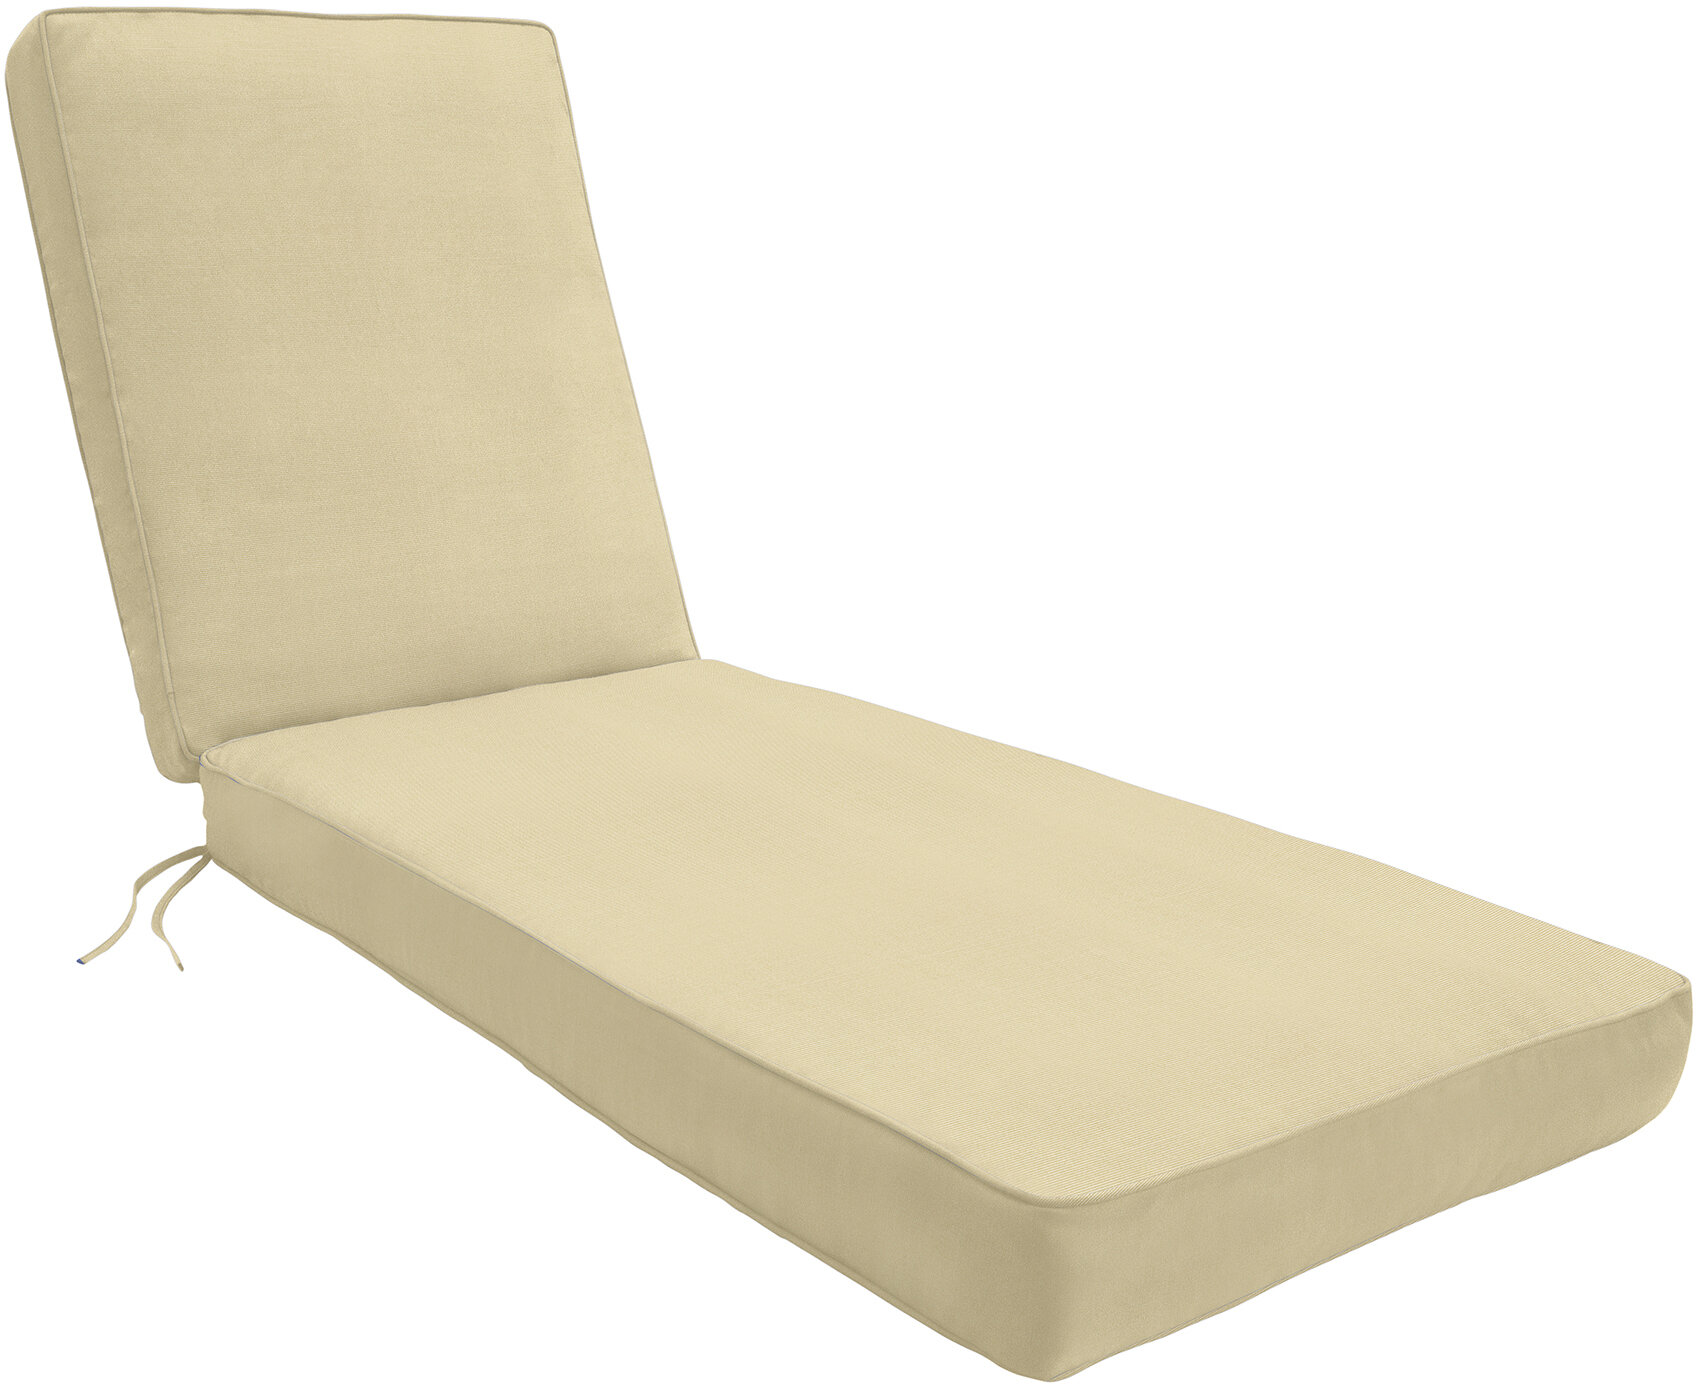 Wayfair Custom Outdoor Cushions Indoor Sunbrella Chaise Lounge Cushion Reviews